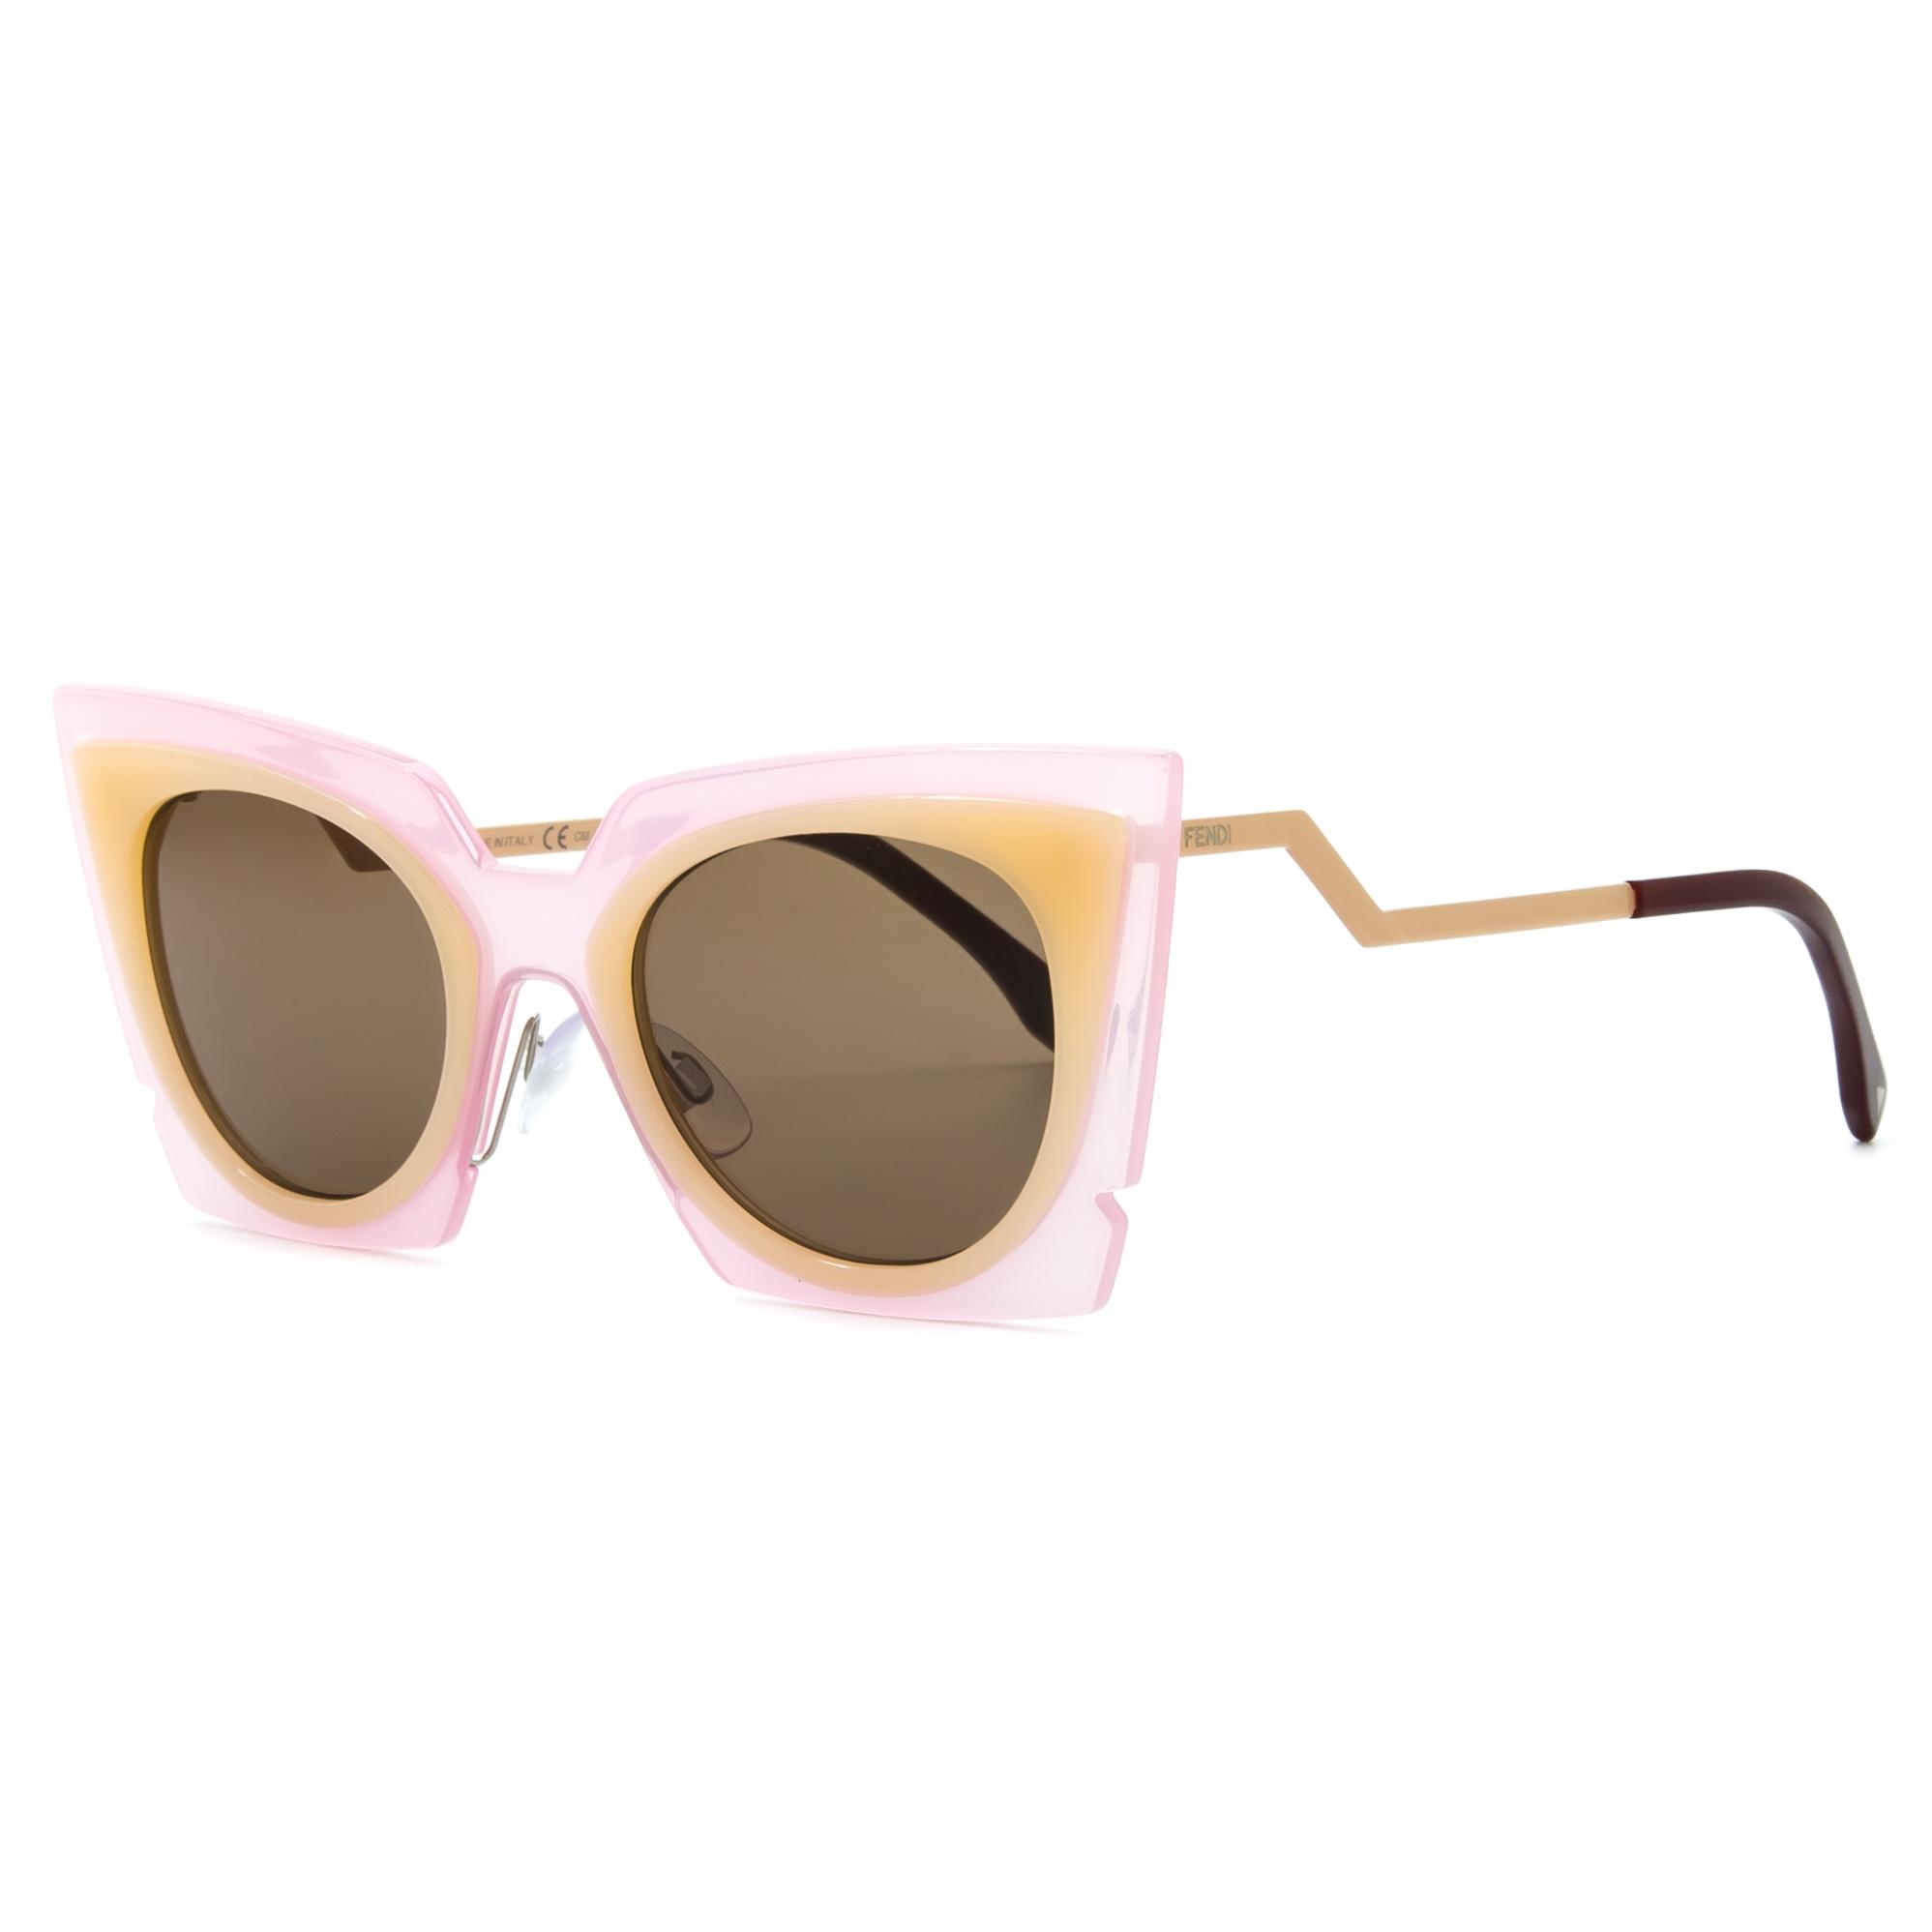 33f0e5912cb Fendi 0117 S Orchid Cat Eye Sunglasses LAQUT Pink   Peach   Tobacco Brown  Lenses FENDI Cat Eye Paradeyes Sunglasses FF 0136 S ...